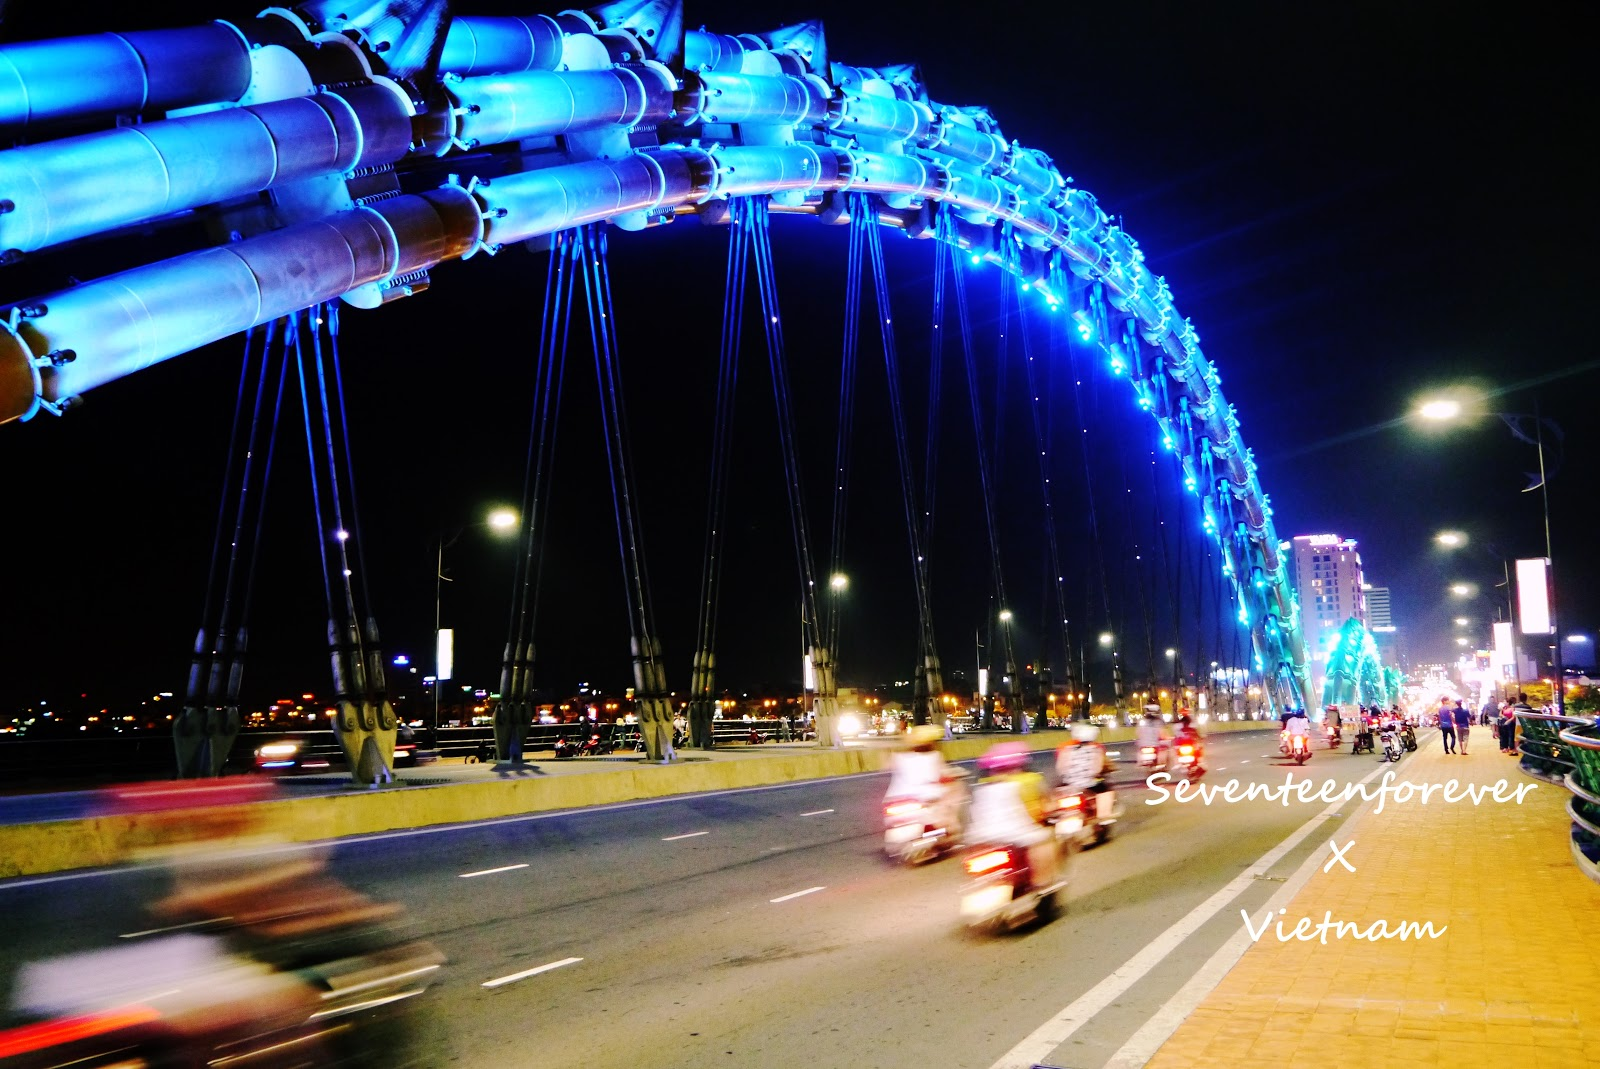 seventeenforever: 〈越南旅遊〉峴港旅遊攻略。值得參考的良心建議